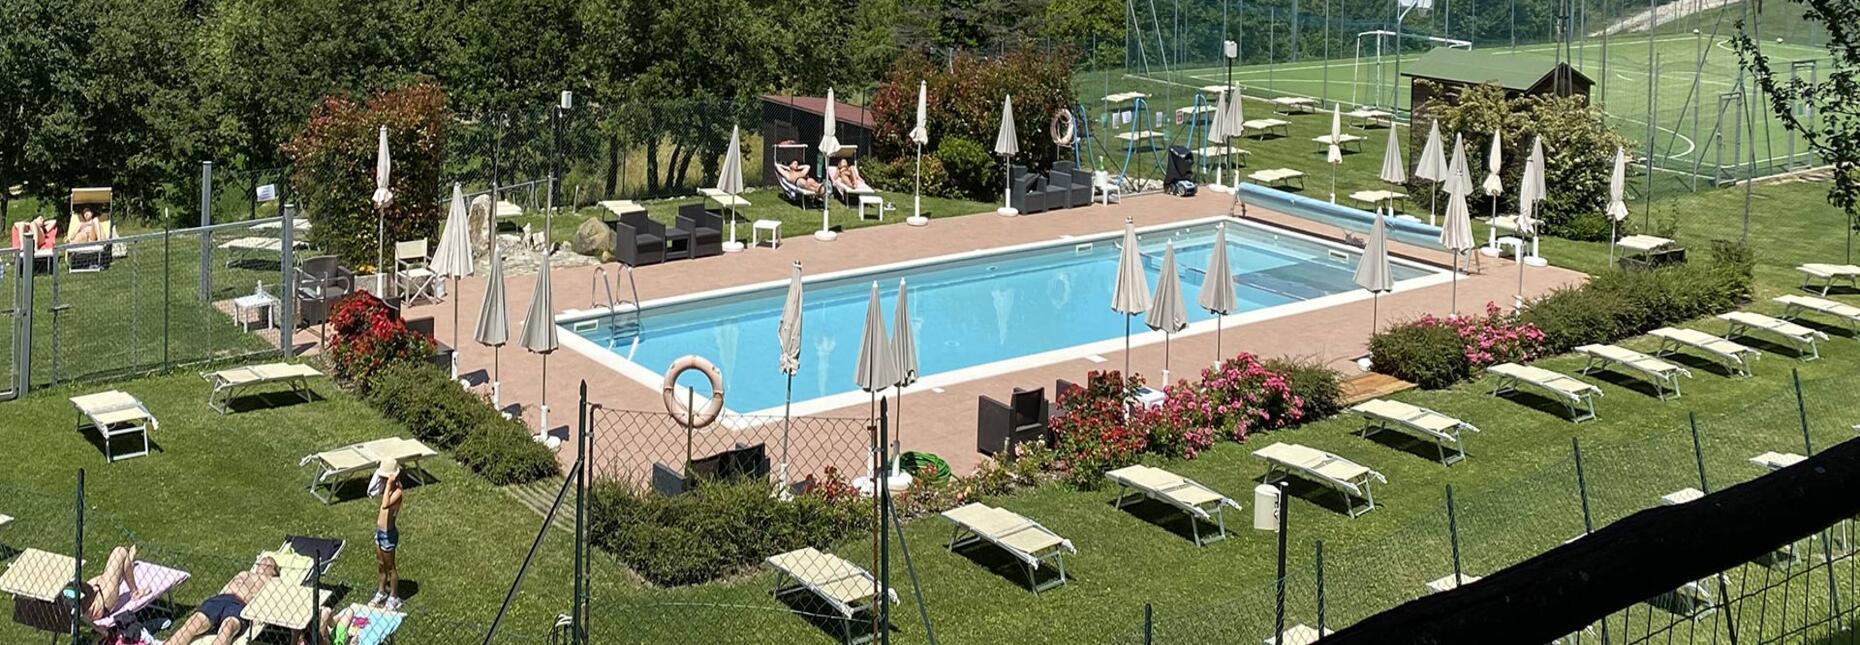 cadigianni en pool 006